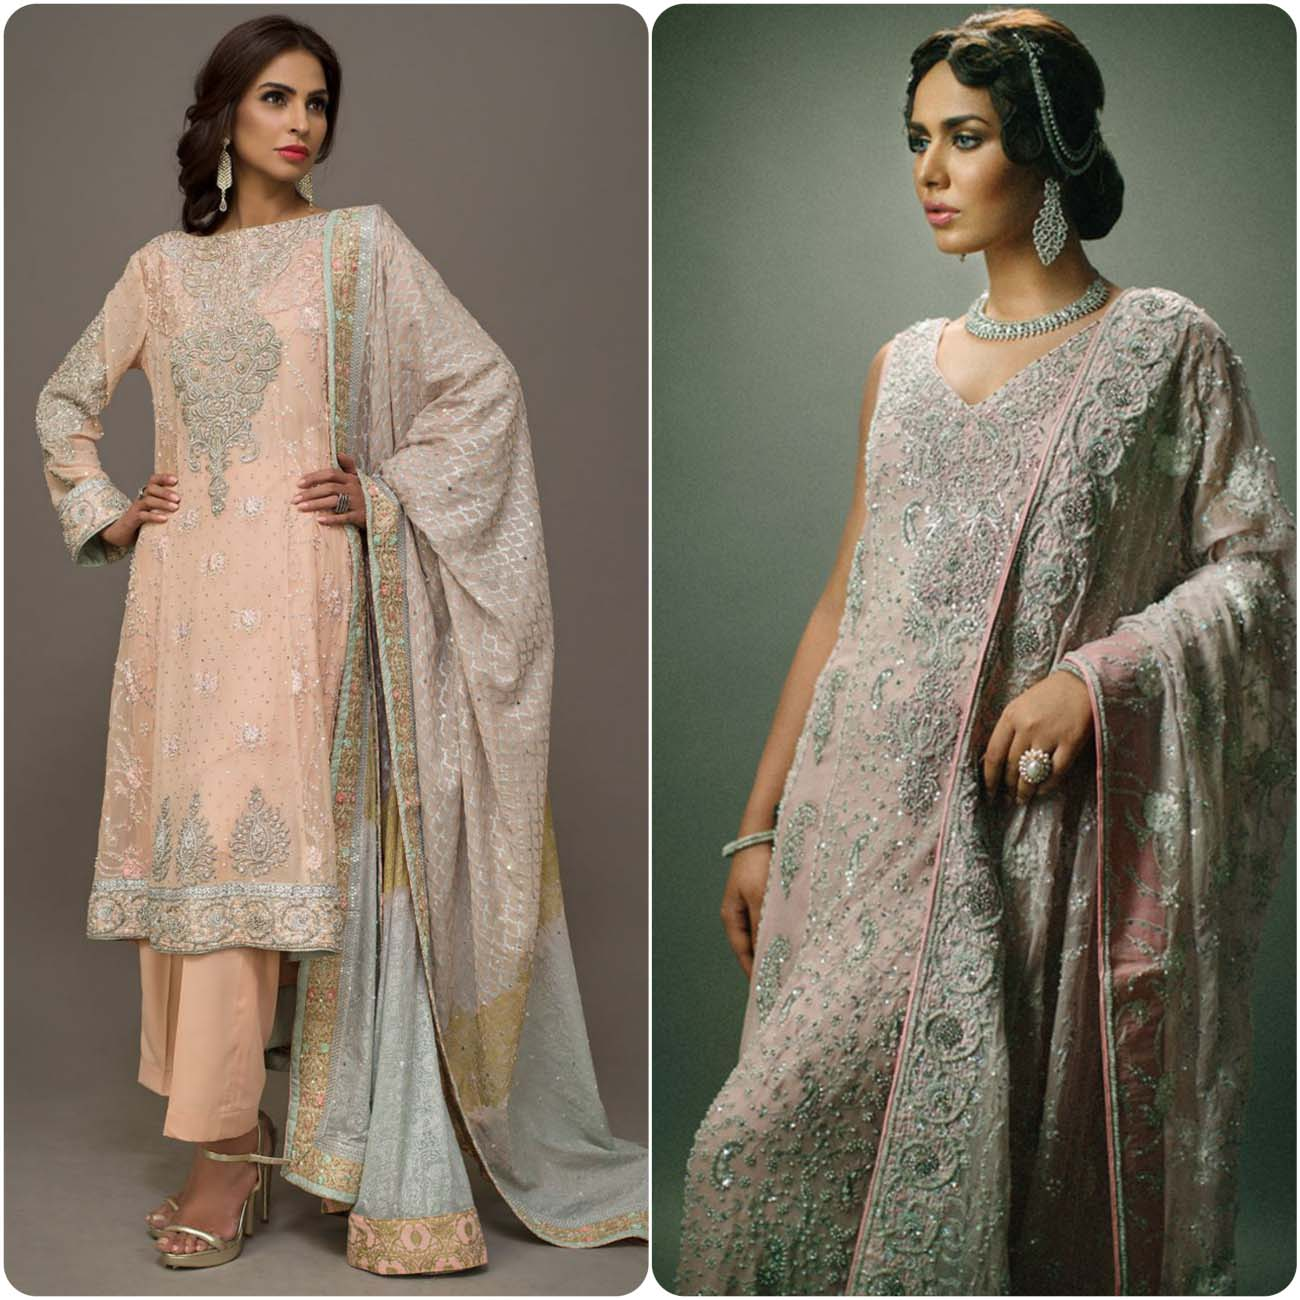 Deepak perwani Wedding Dresses Collection Fo Women 2016-2017...styloplanet (10)